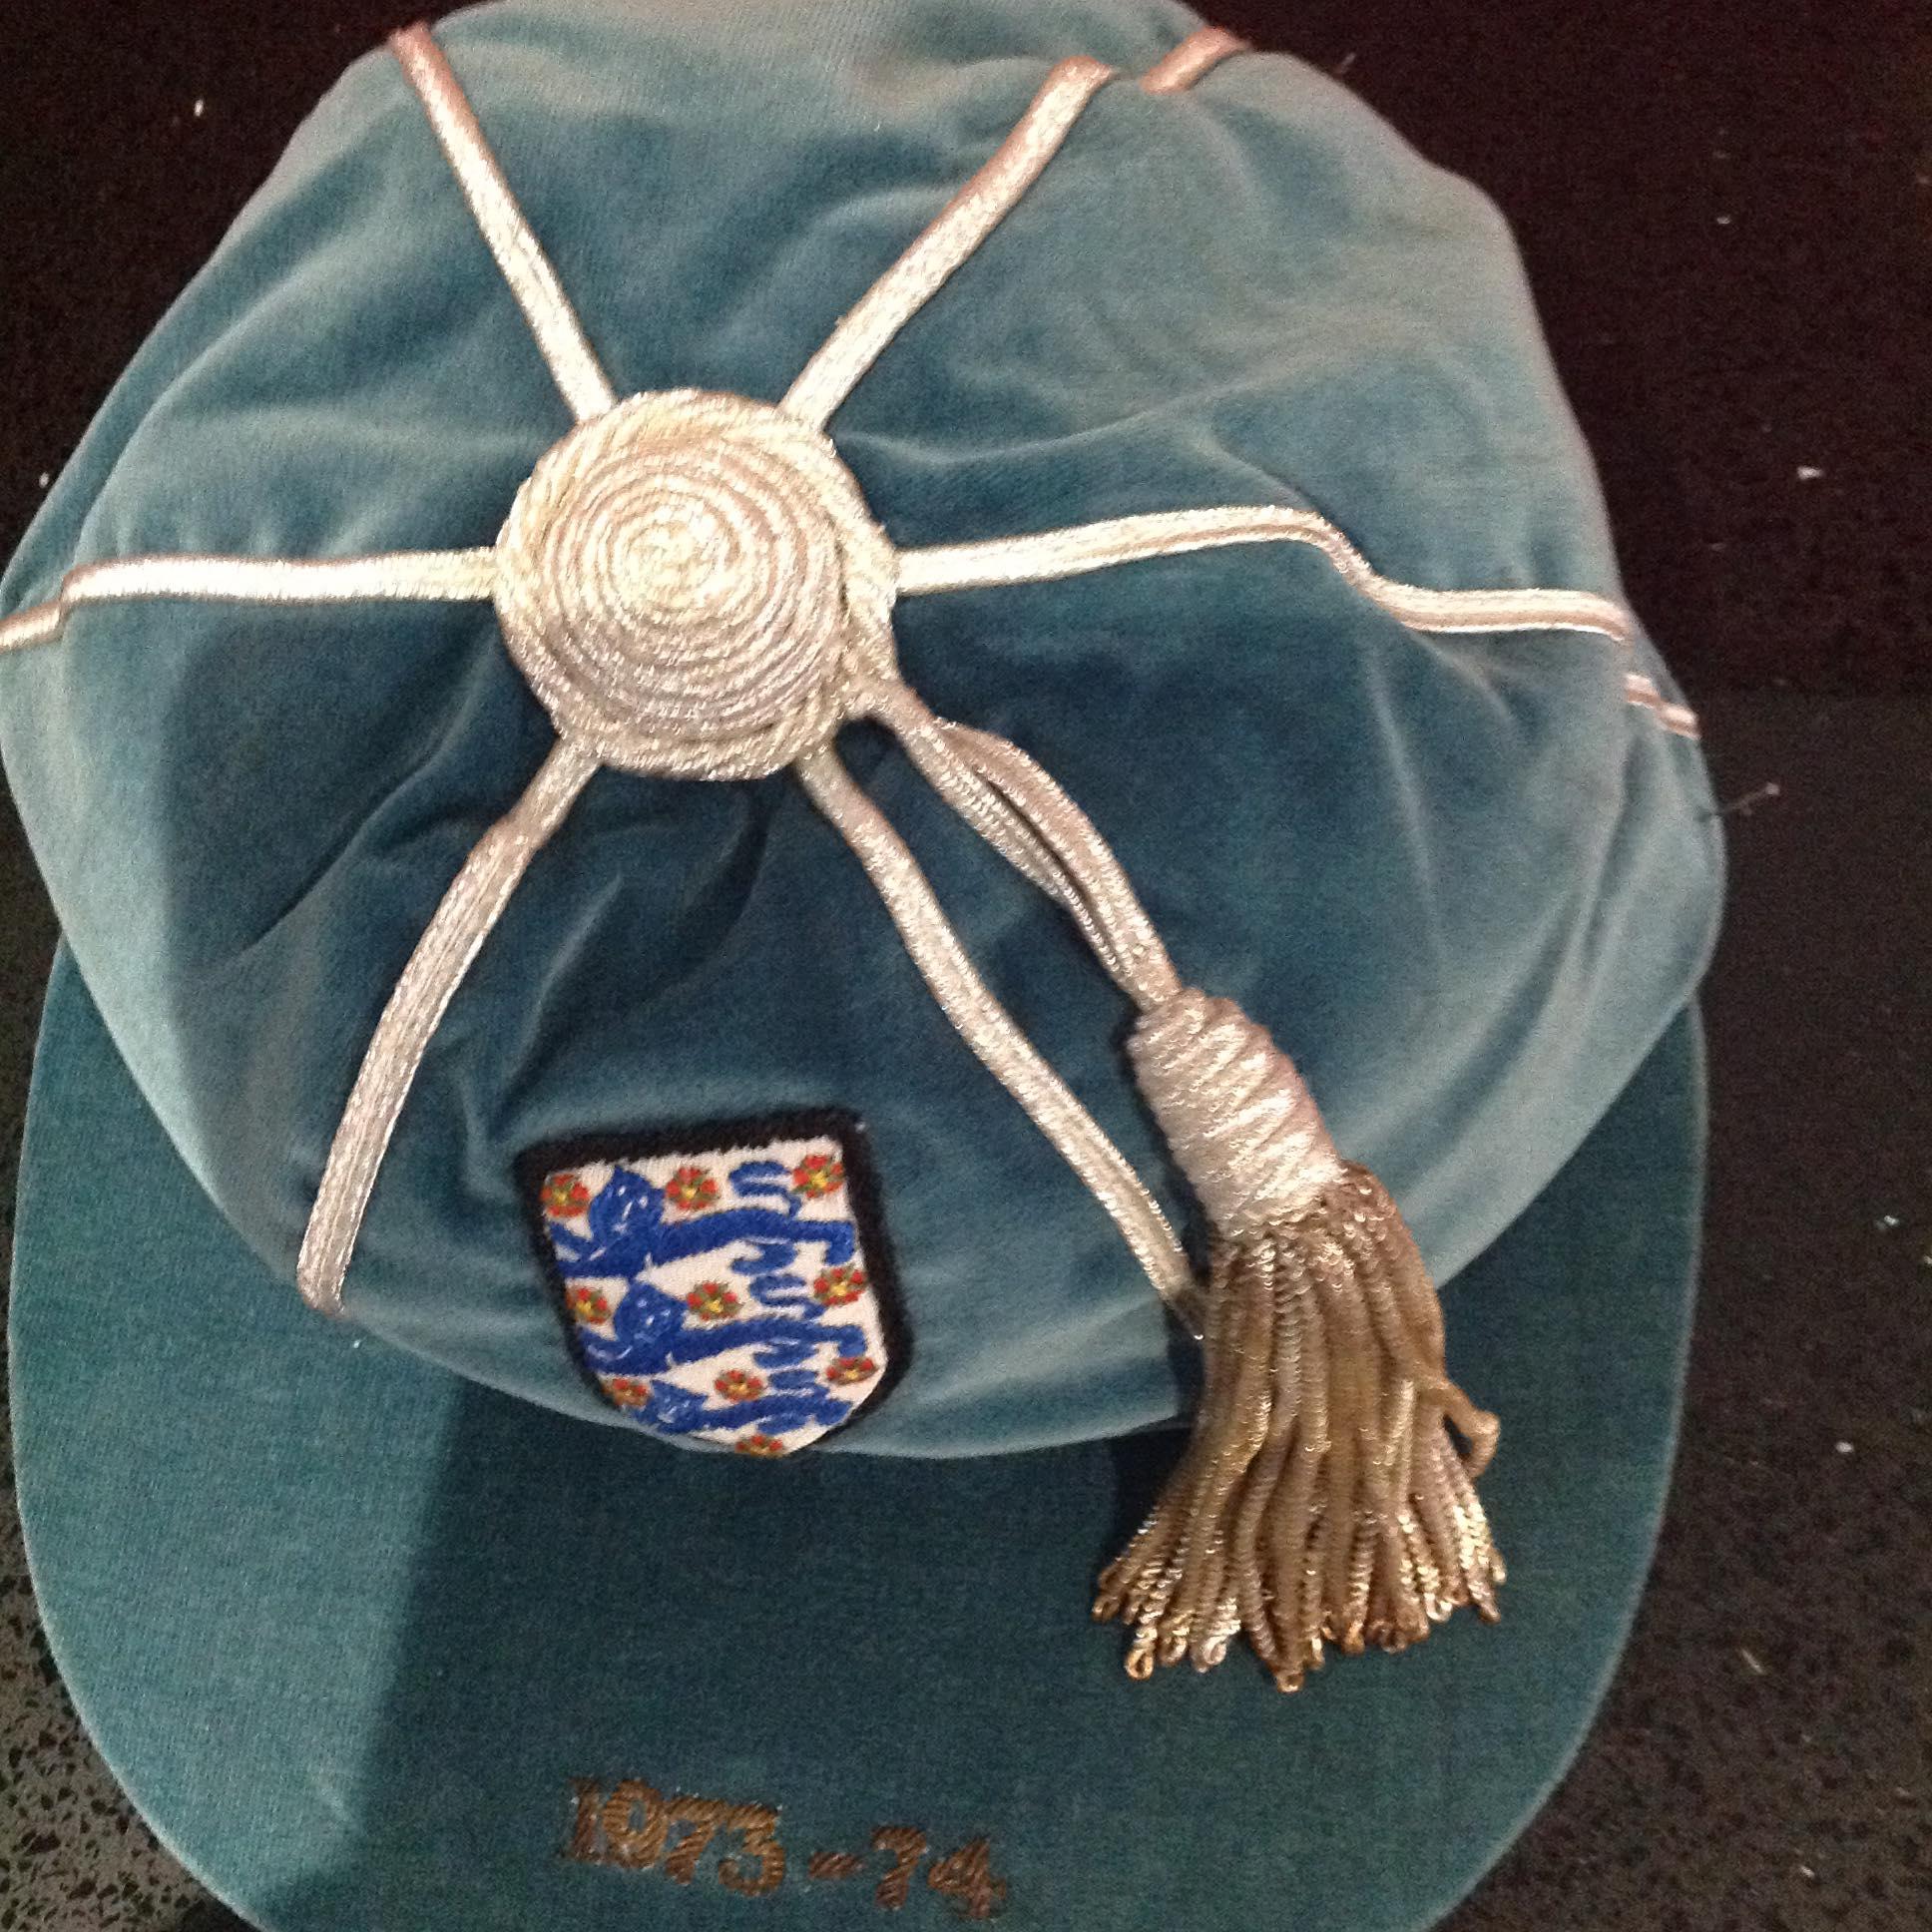 England international cap values